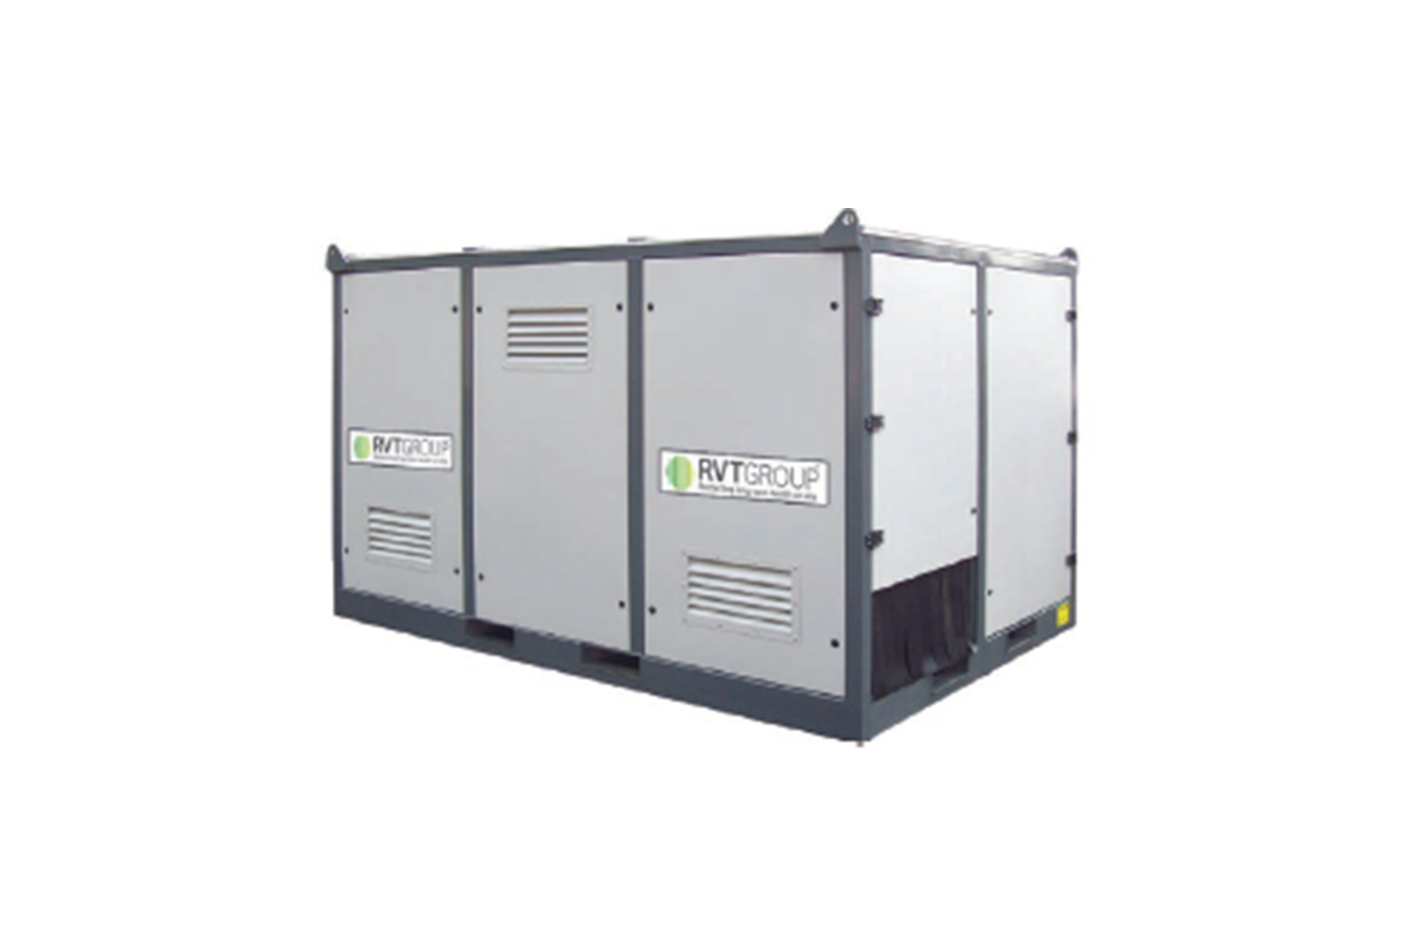 MBR 280 DF Boiler